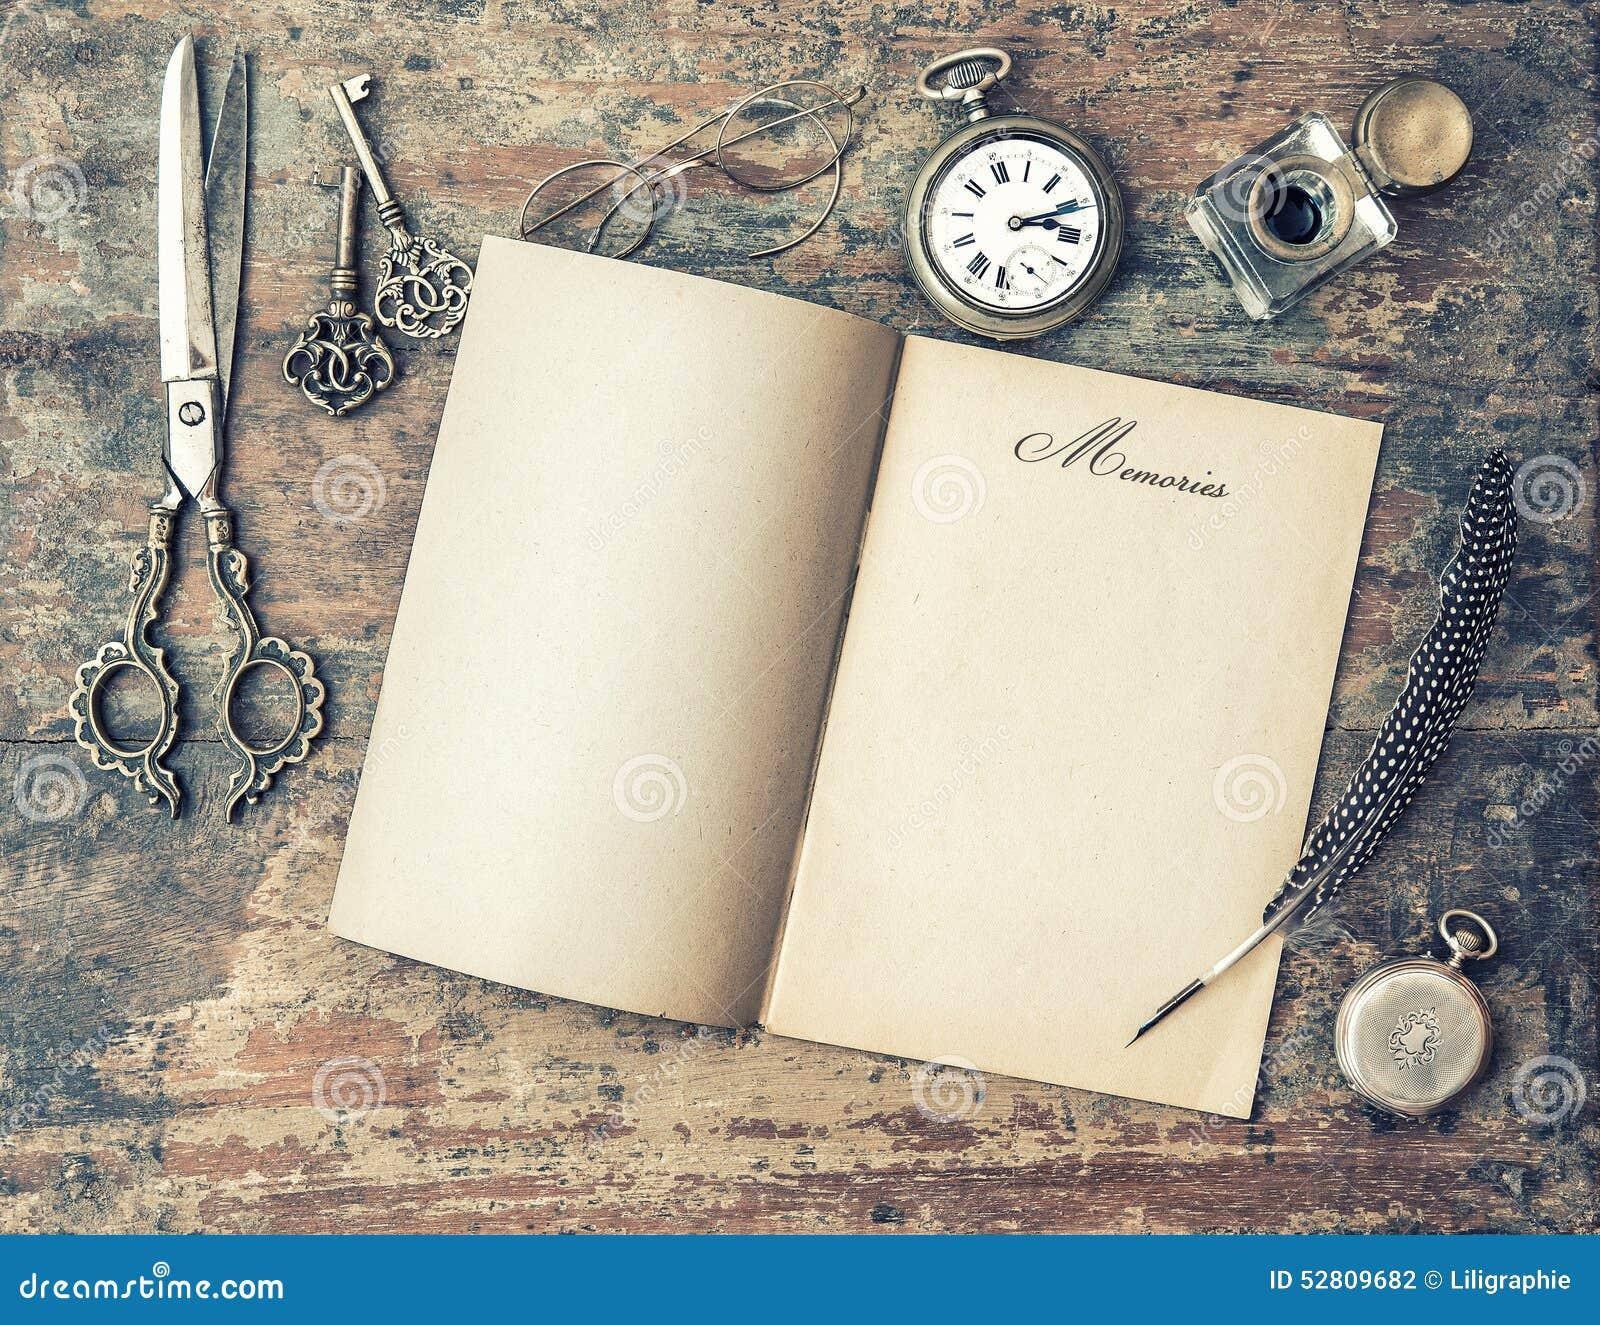 Writing Your Memories